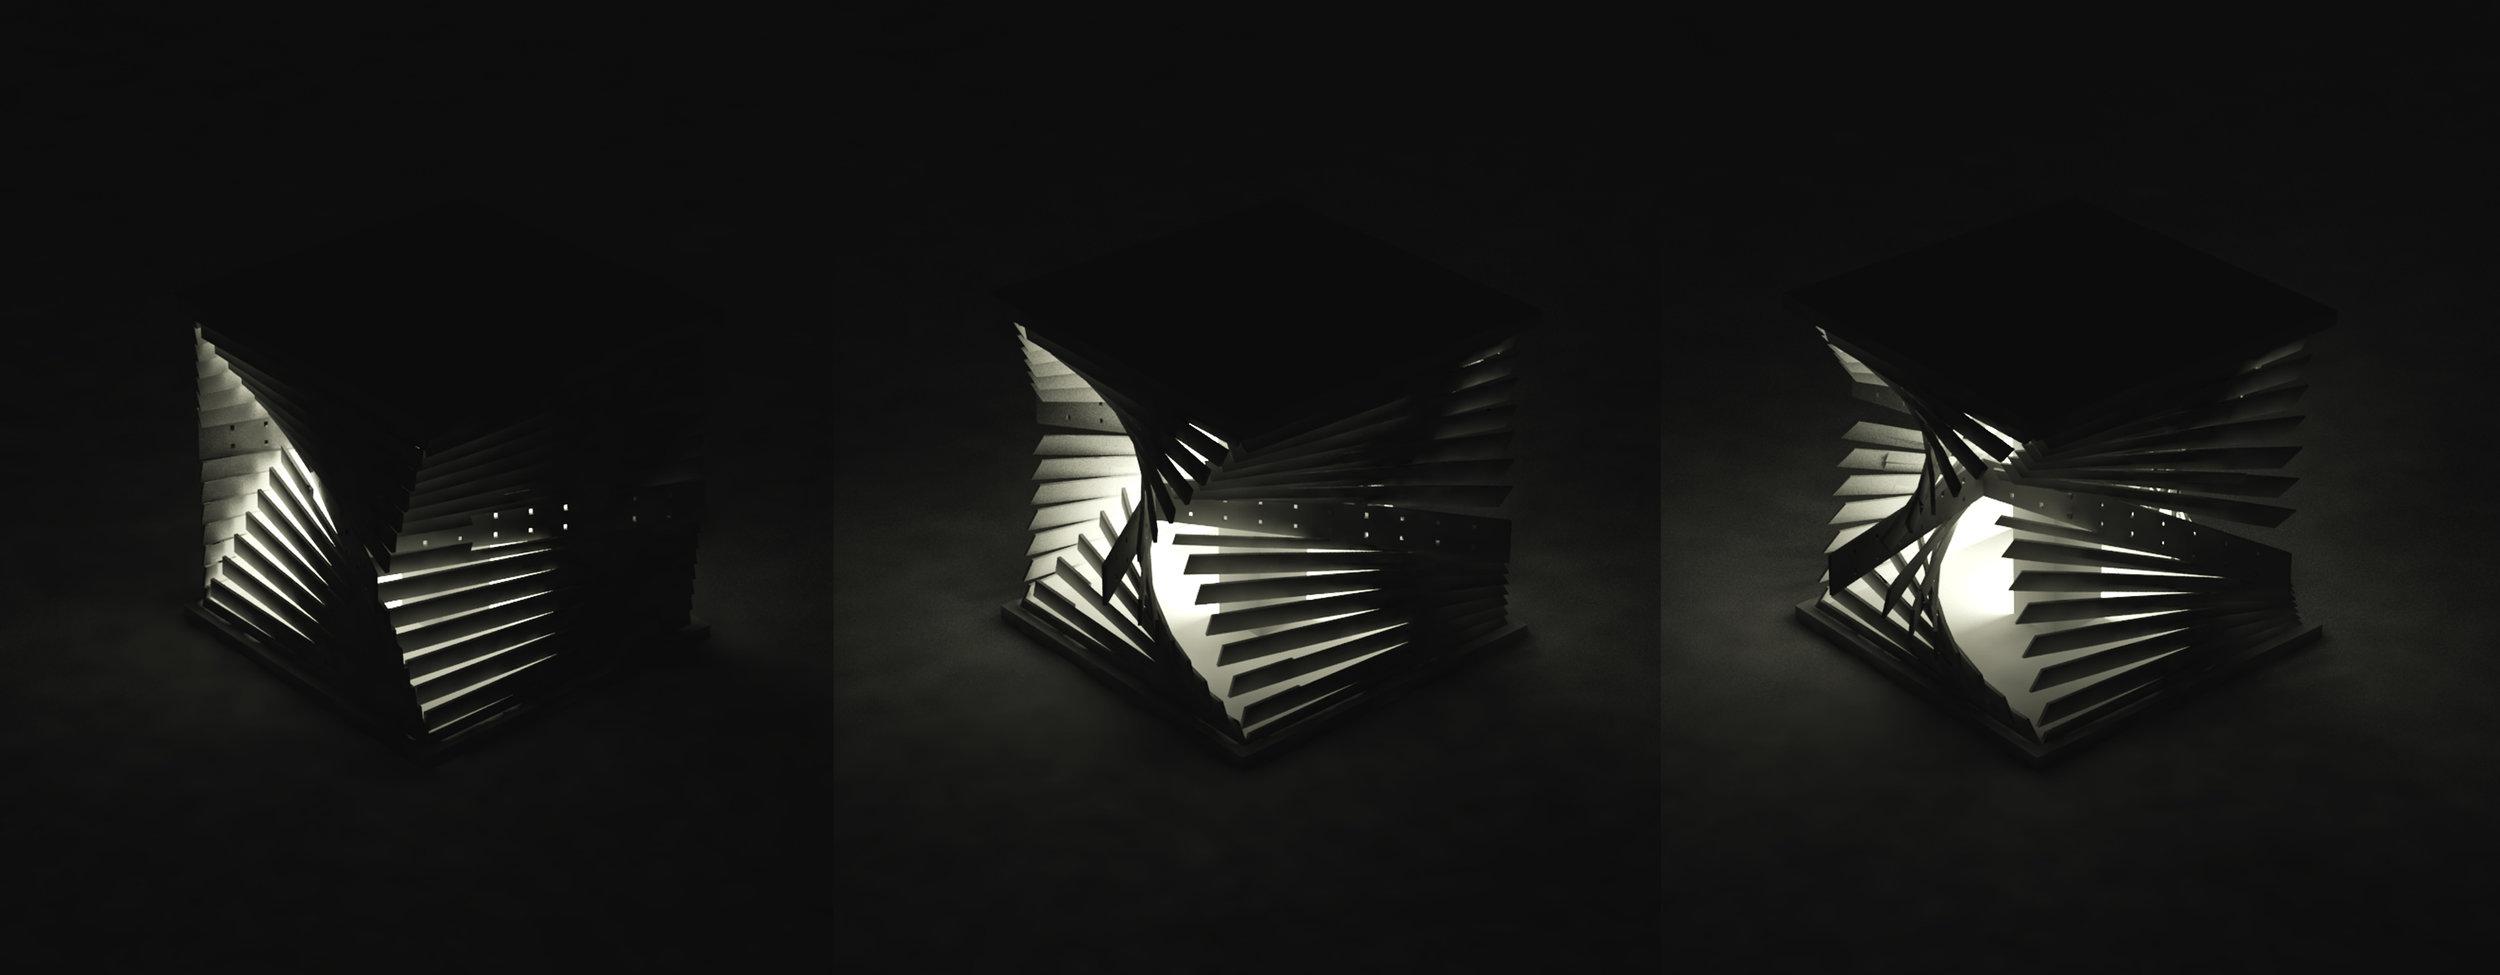 Lamp in three levels of brightness